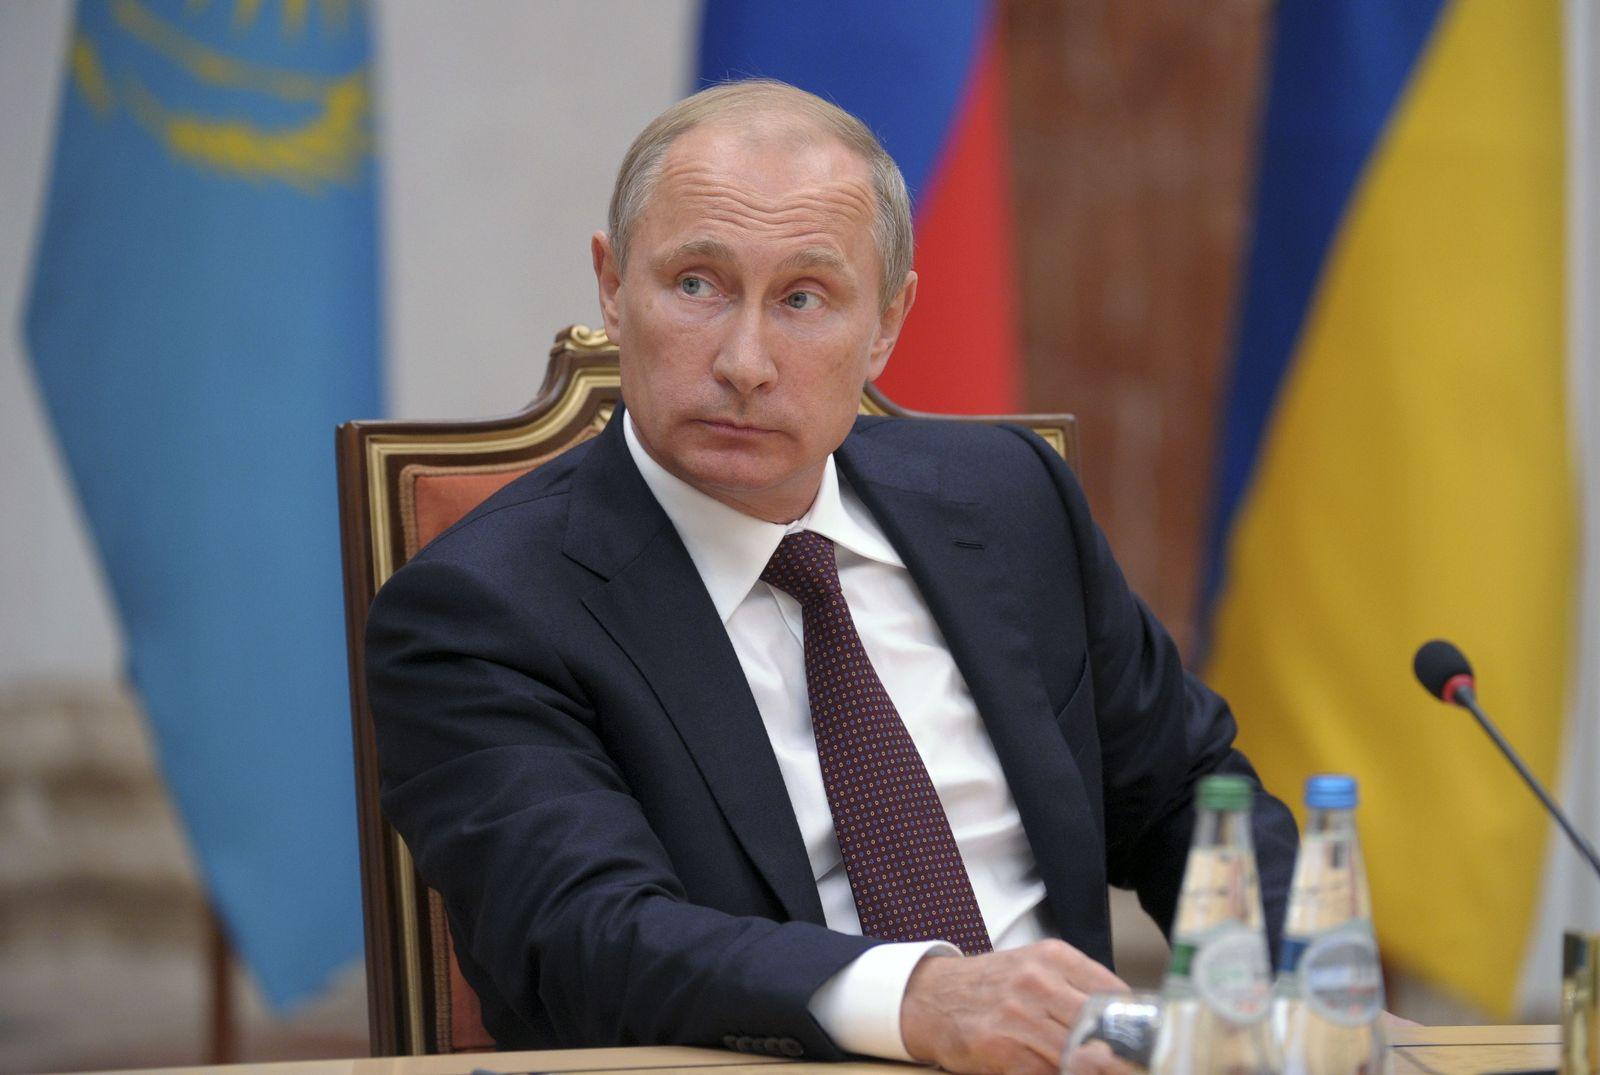 UKRAINE-CRISIS/PUTIN